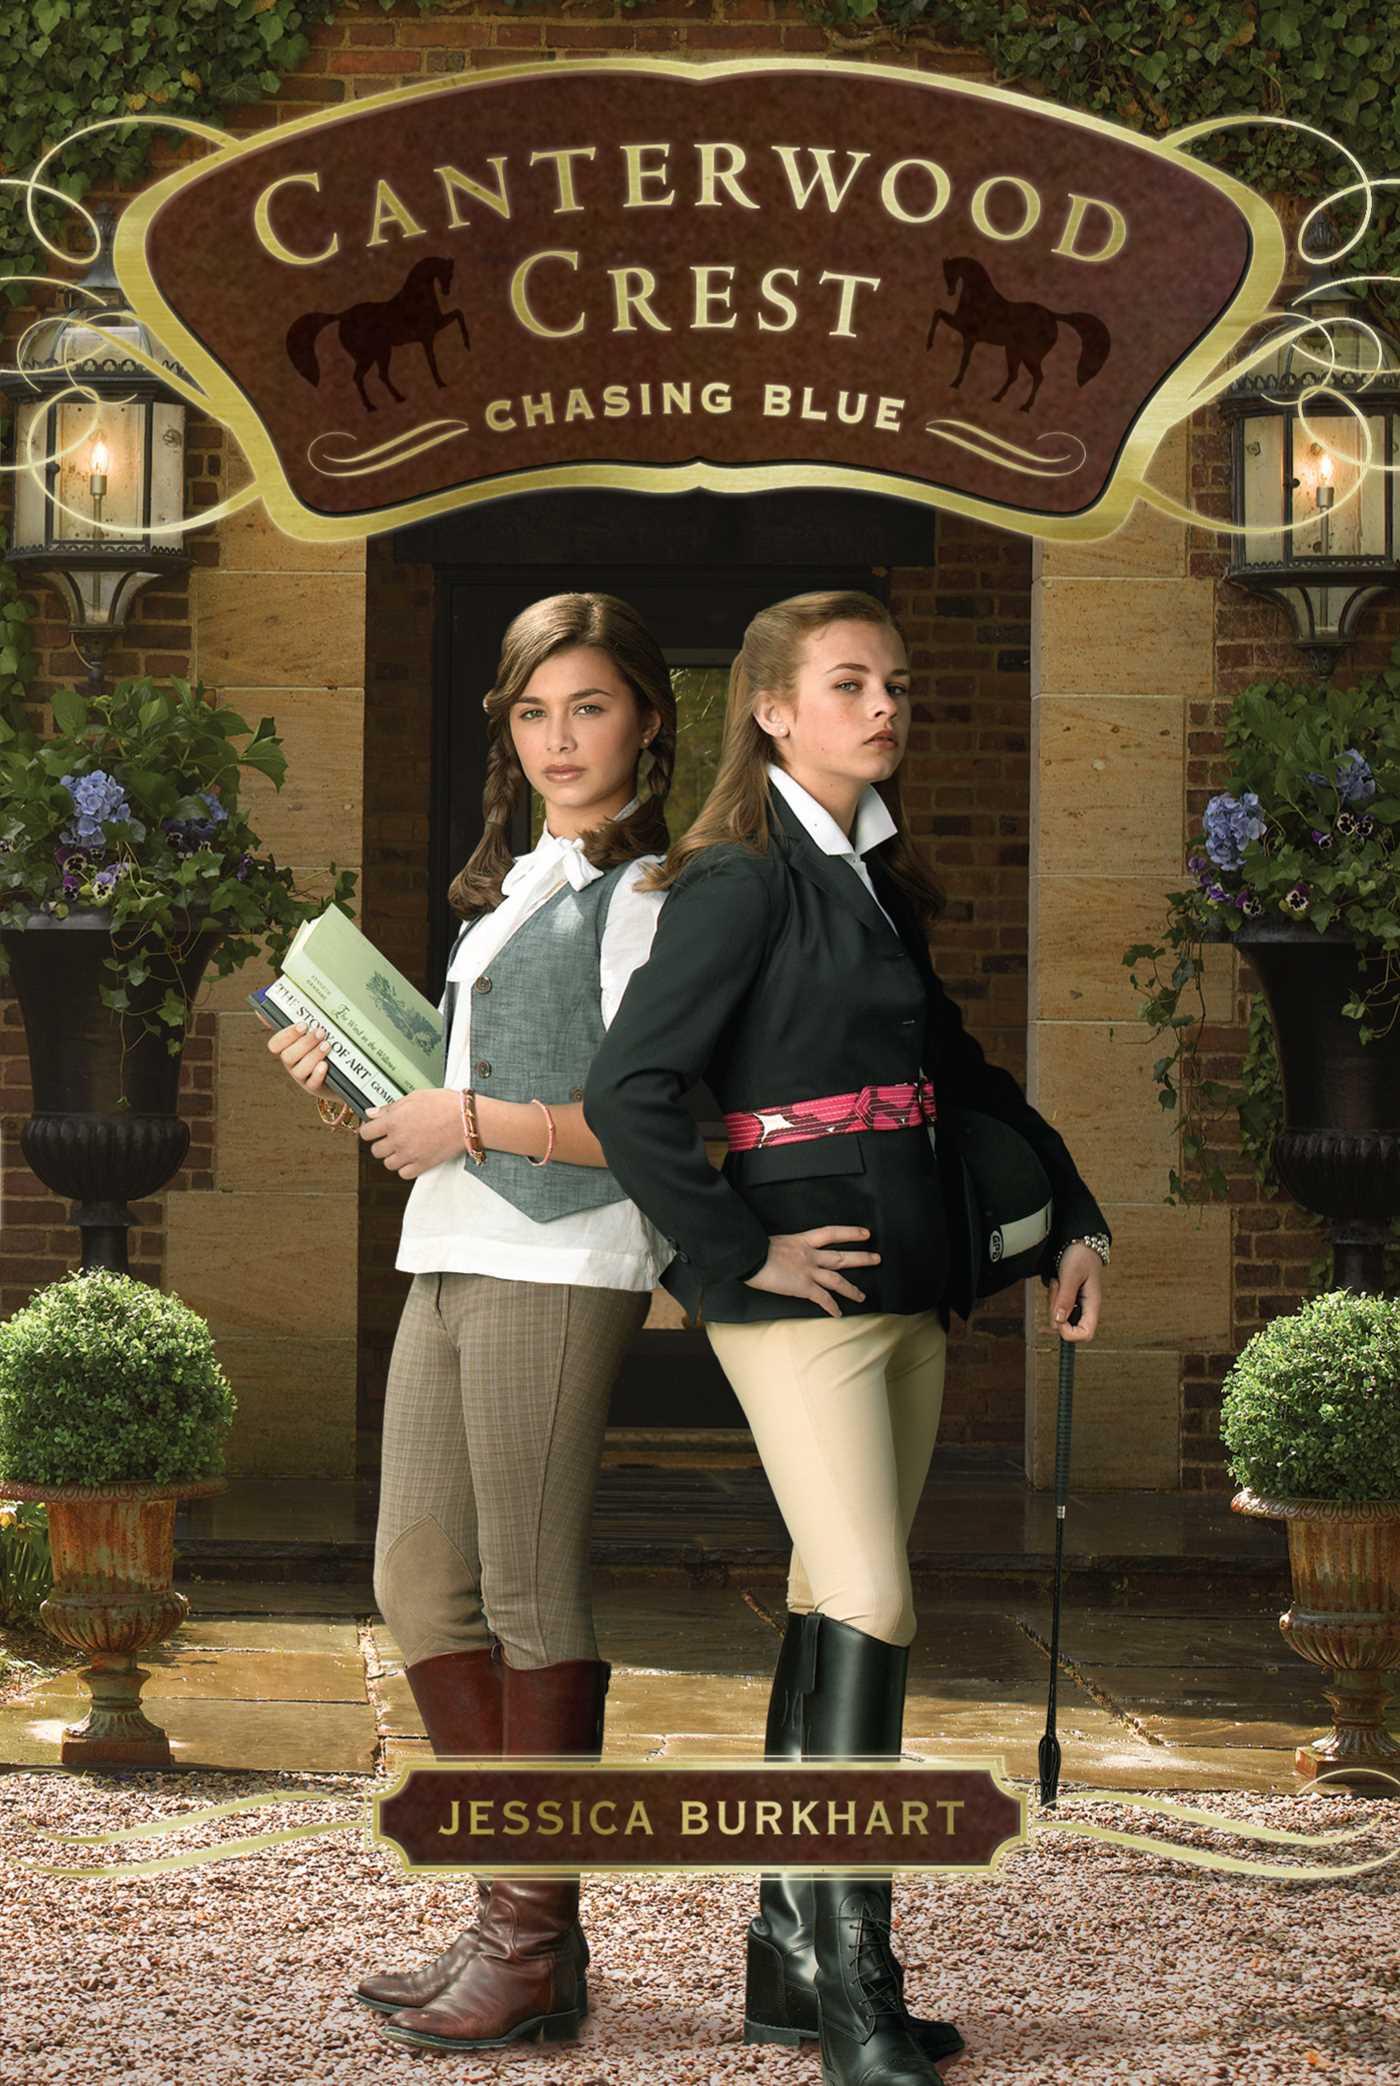 Chasing blue 9781442412736 hr